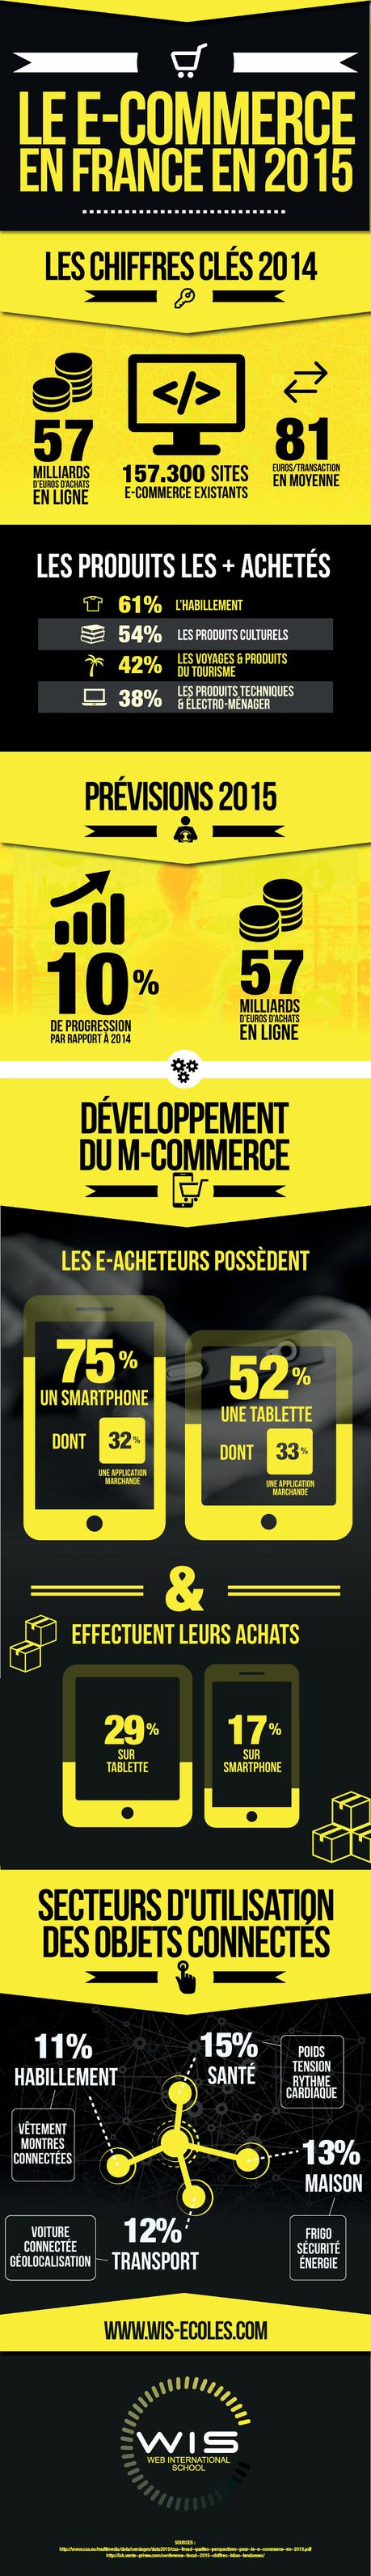 #Infographie – Le #Ecommerce en France en 2015